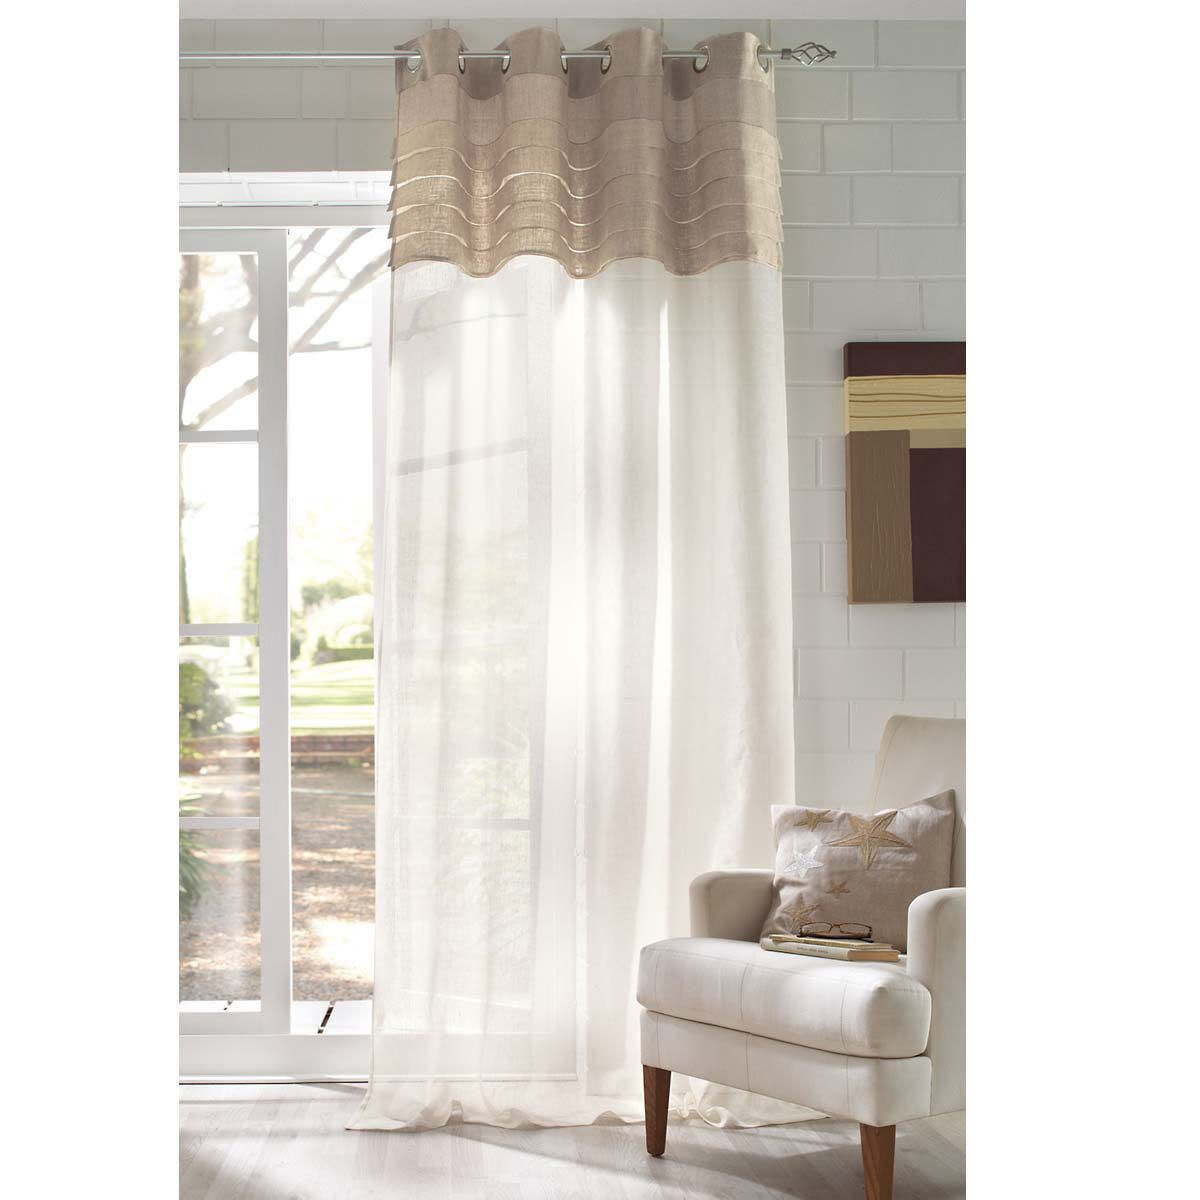 Vorhang Mix, Ösenaufhängung, Leinen ca. L250xB140 cm